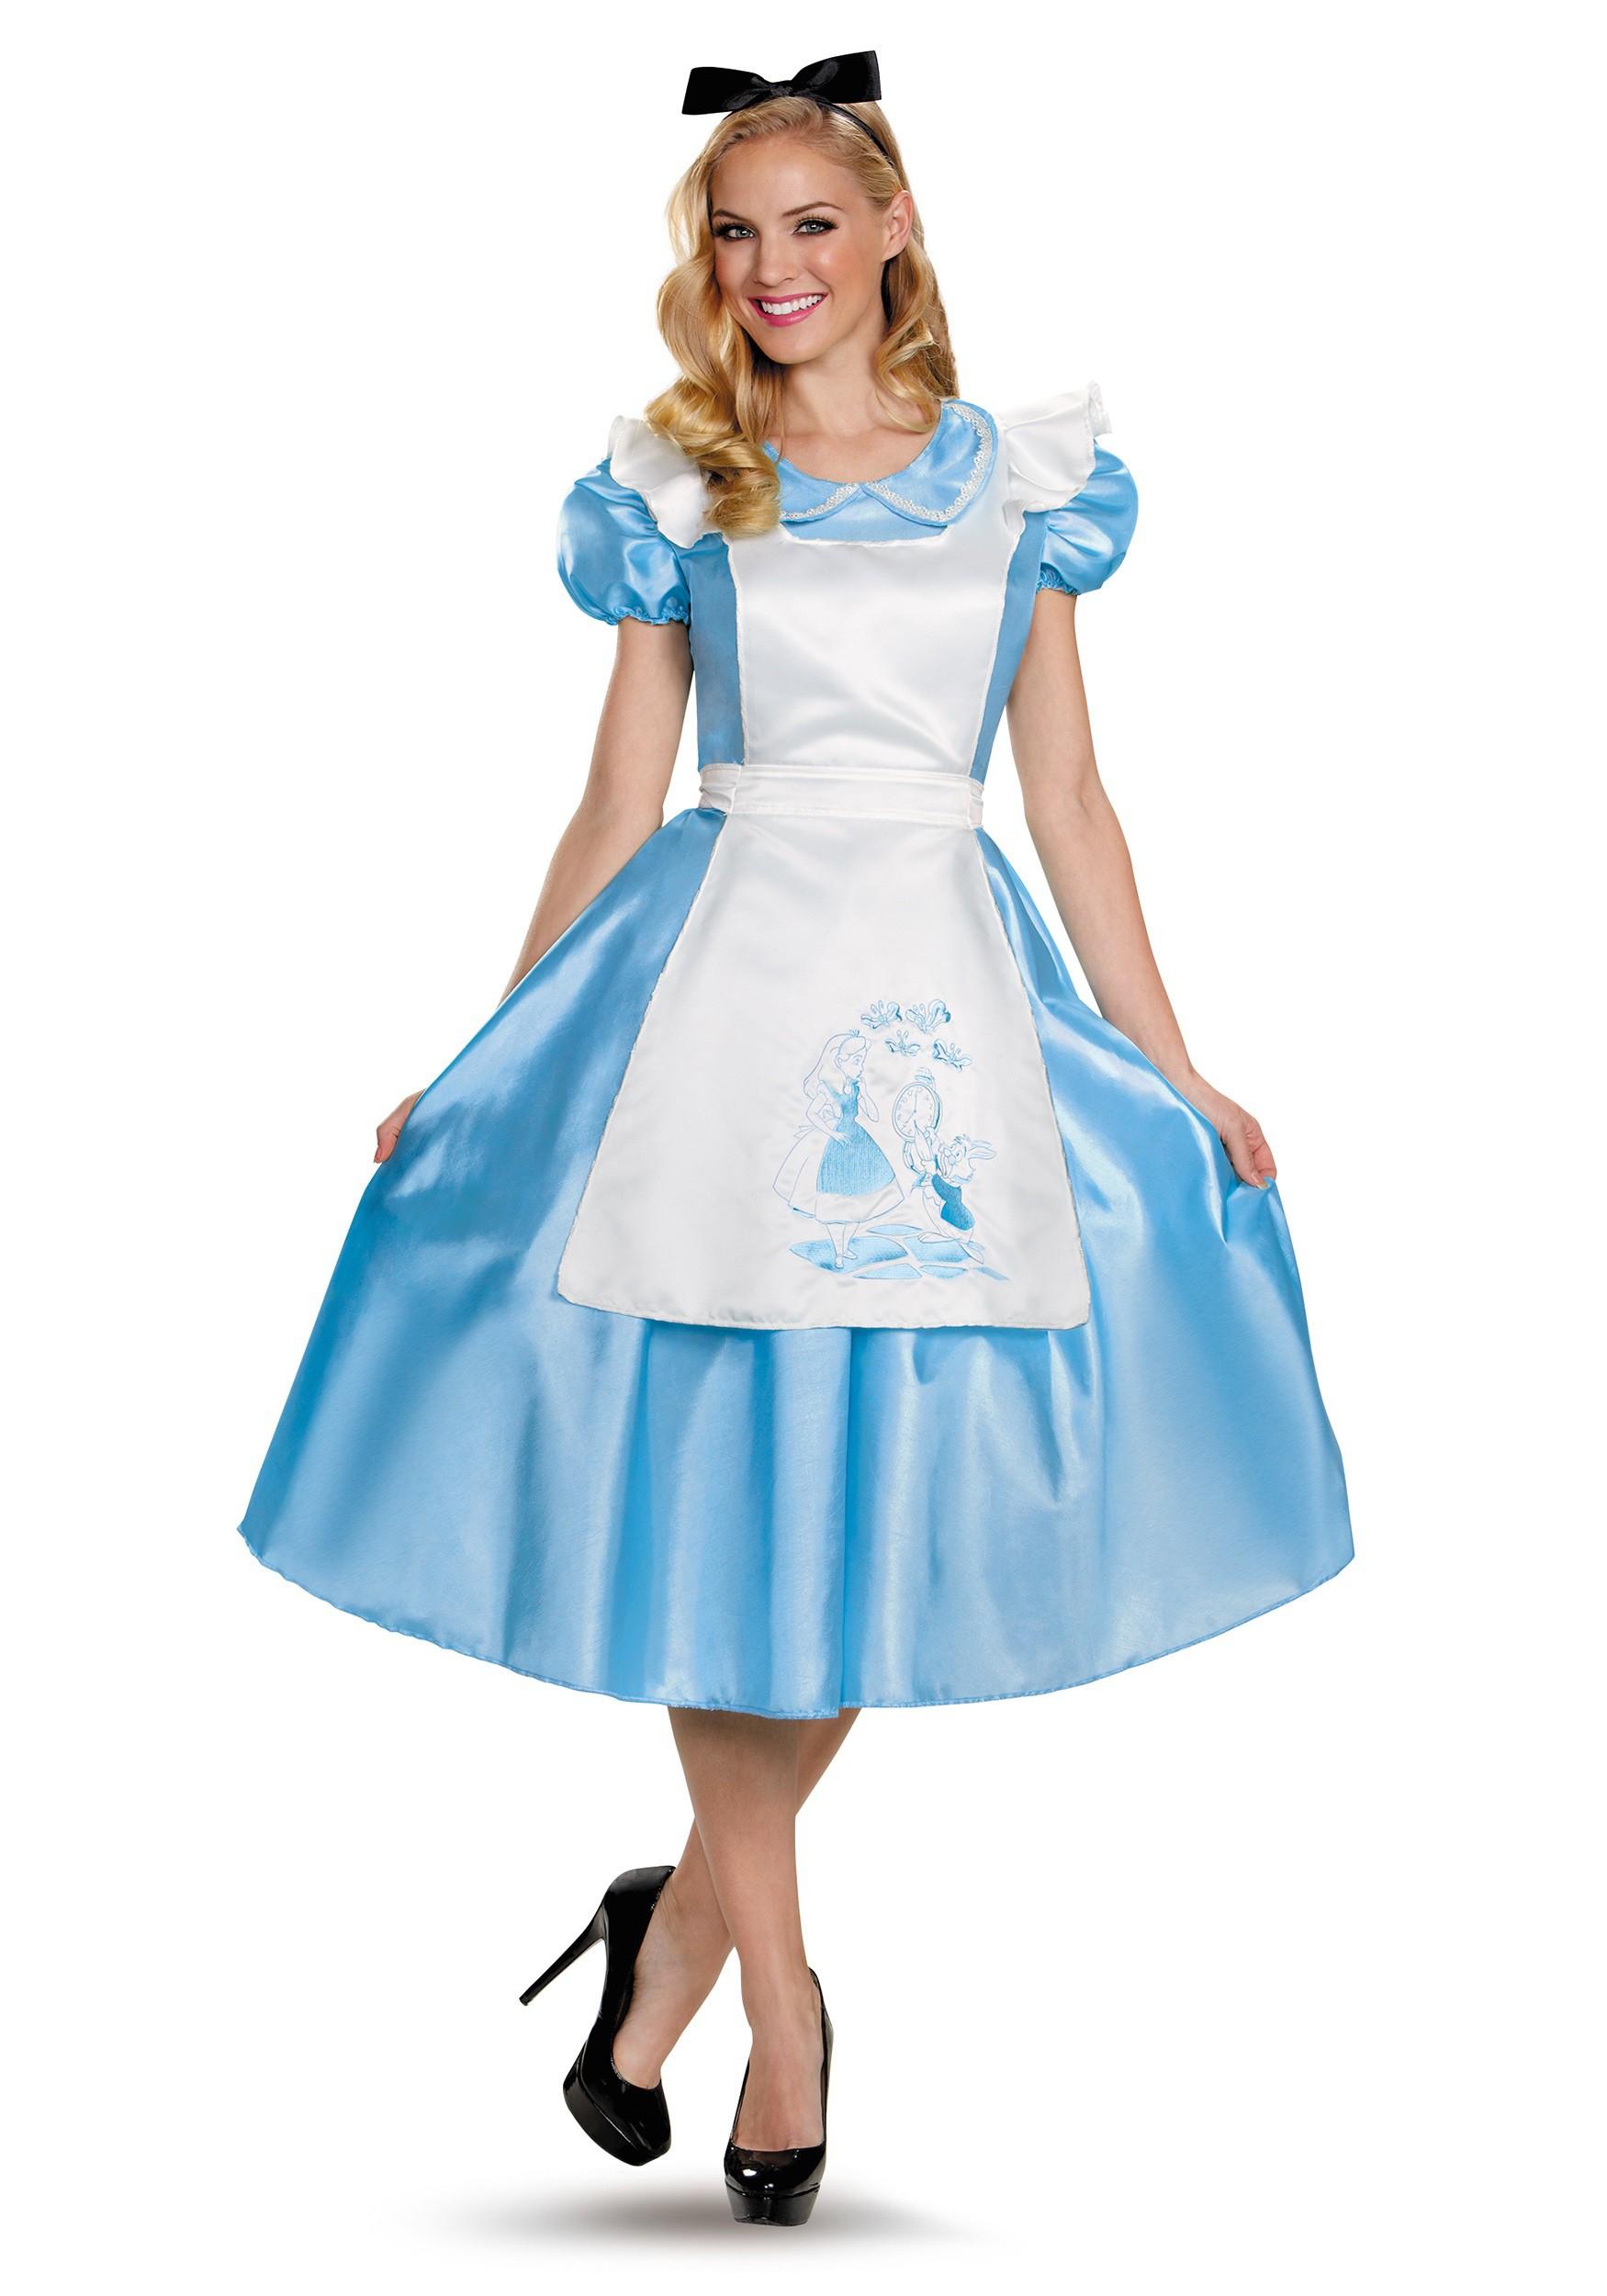 White apron alice wonderland costume - White Apron Alice Wonderland Costume 61